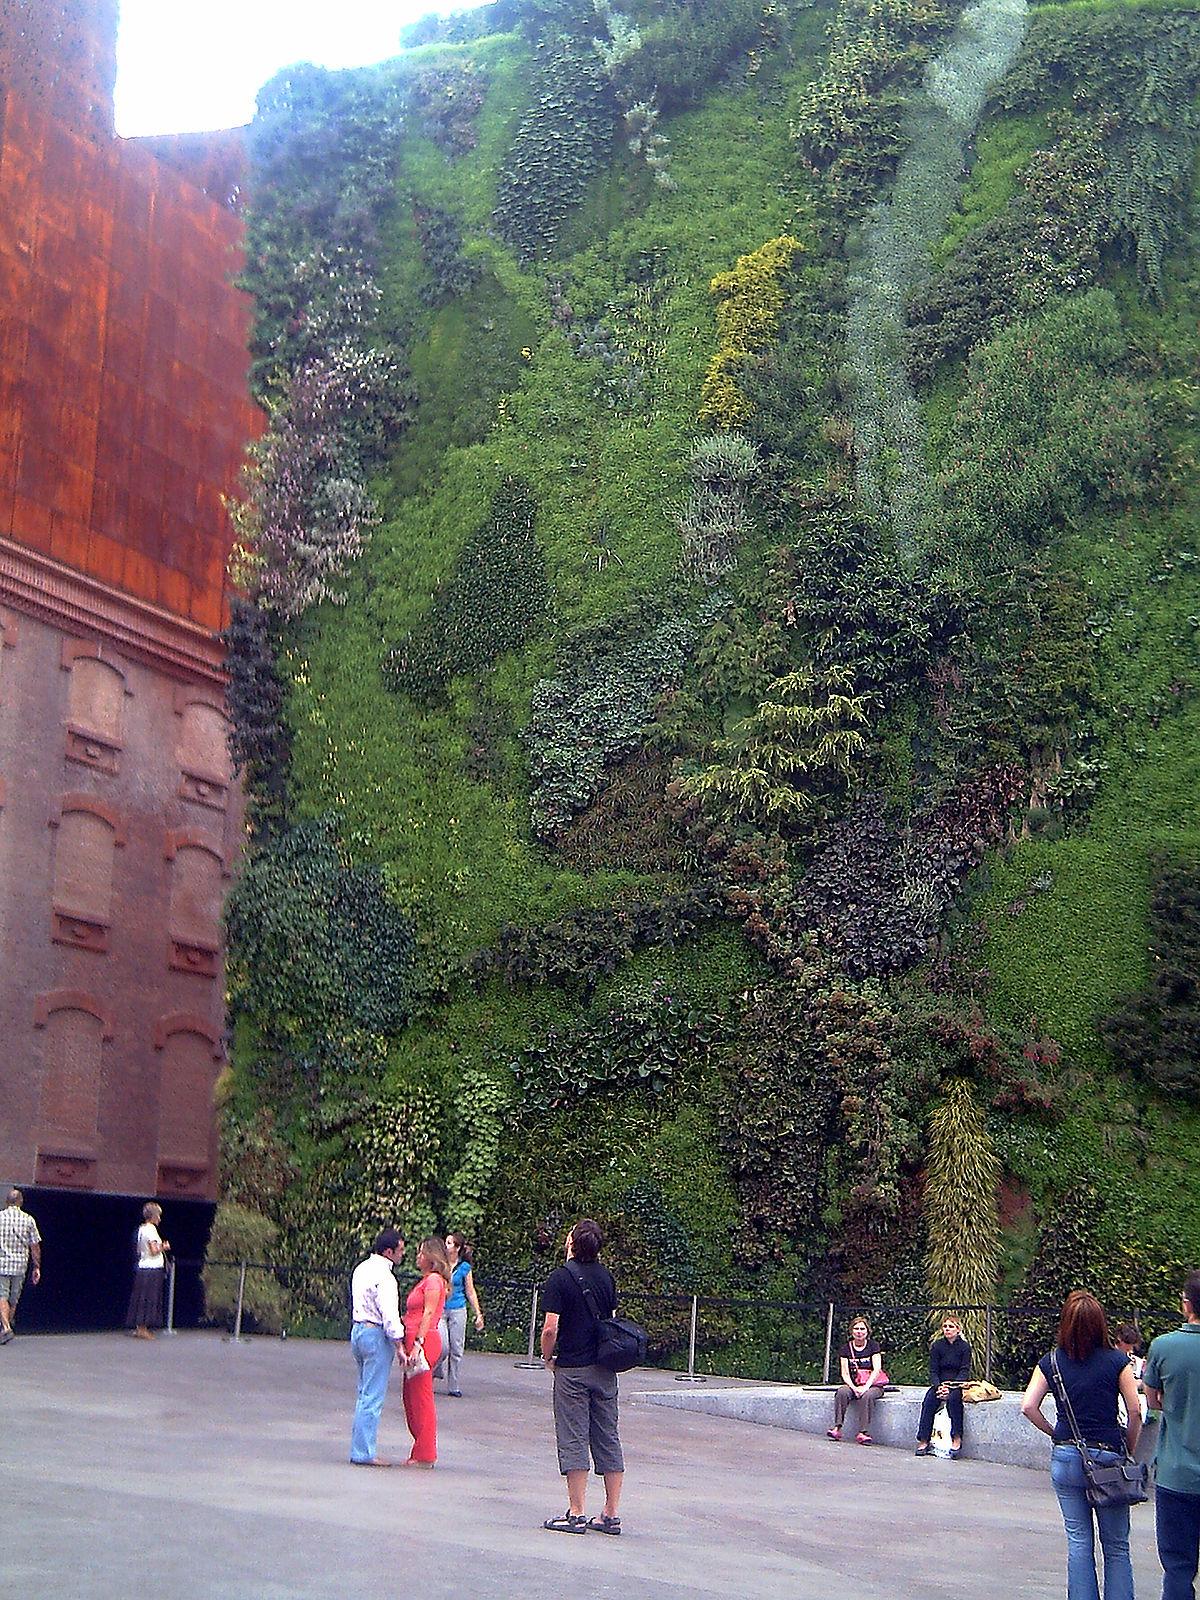 Pared de cultivo wikipedia la enciclopedia libre for Que es un jardin vertical